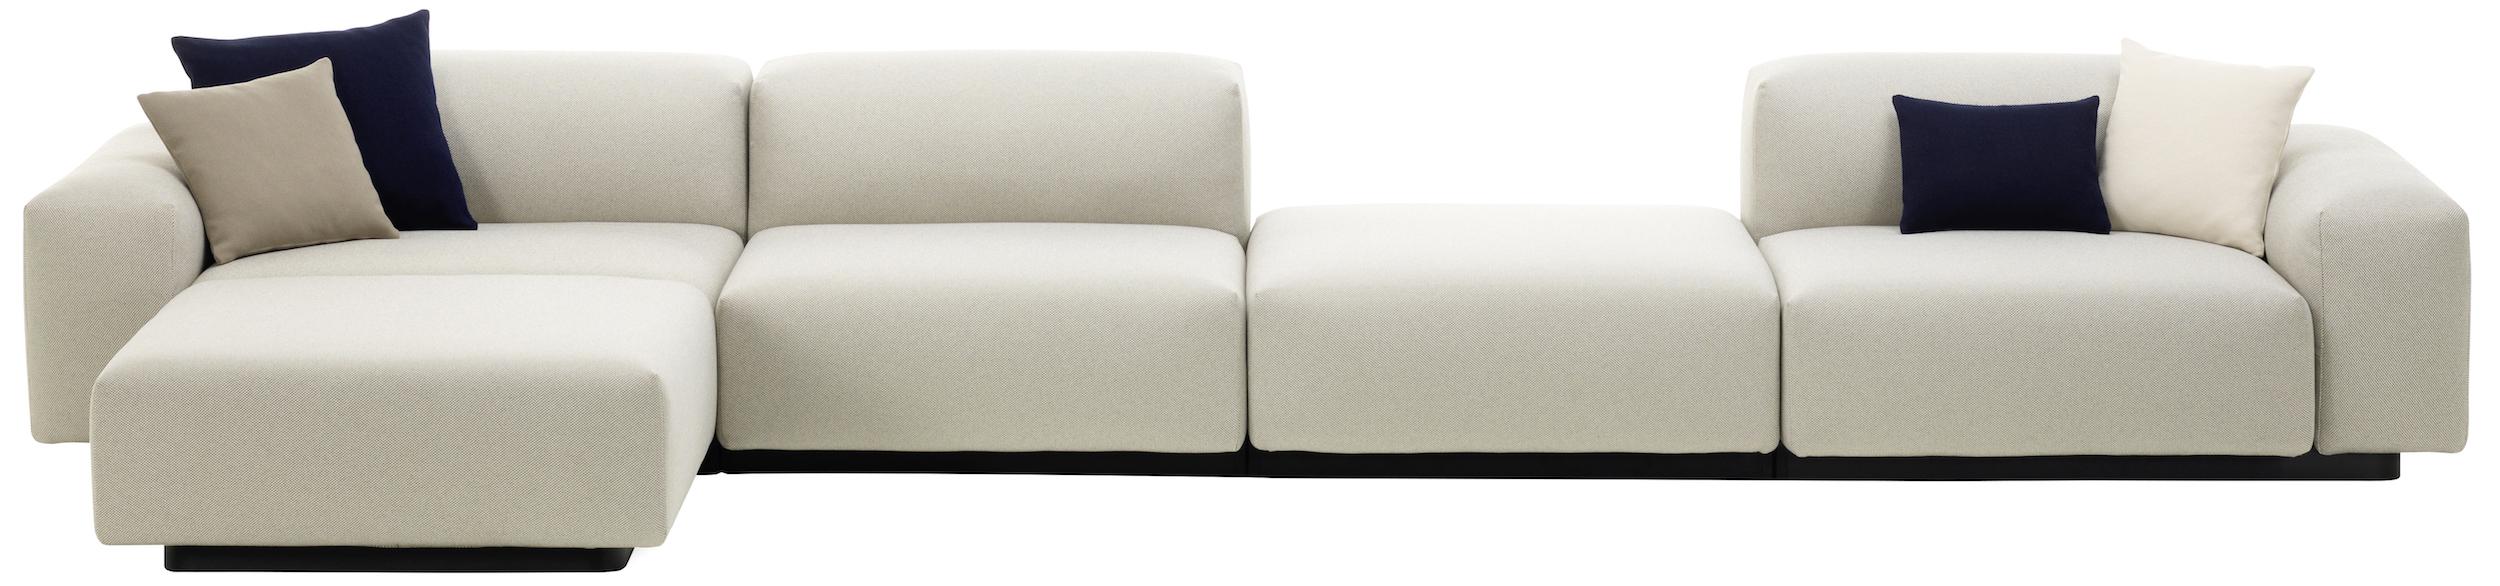 Astonishing Vitra Soft Modular Sofa Jasper Morrison Caraccident5 Cool Chair Designs And Ideas Caraccident5Info